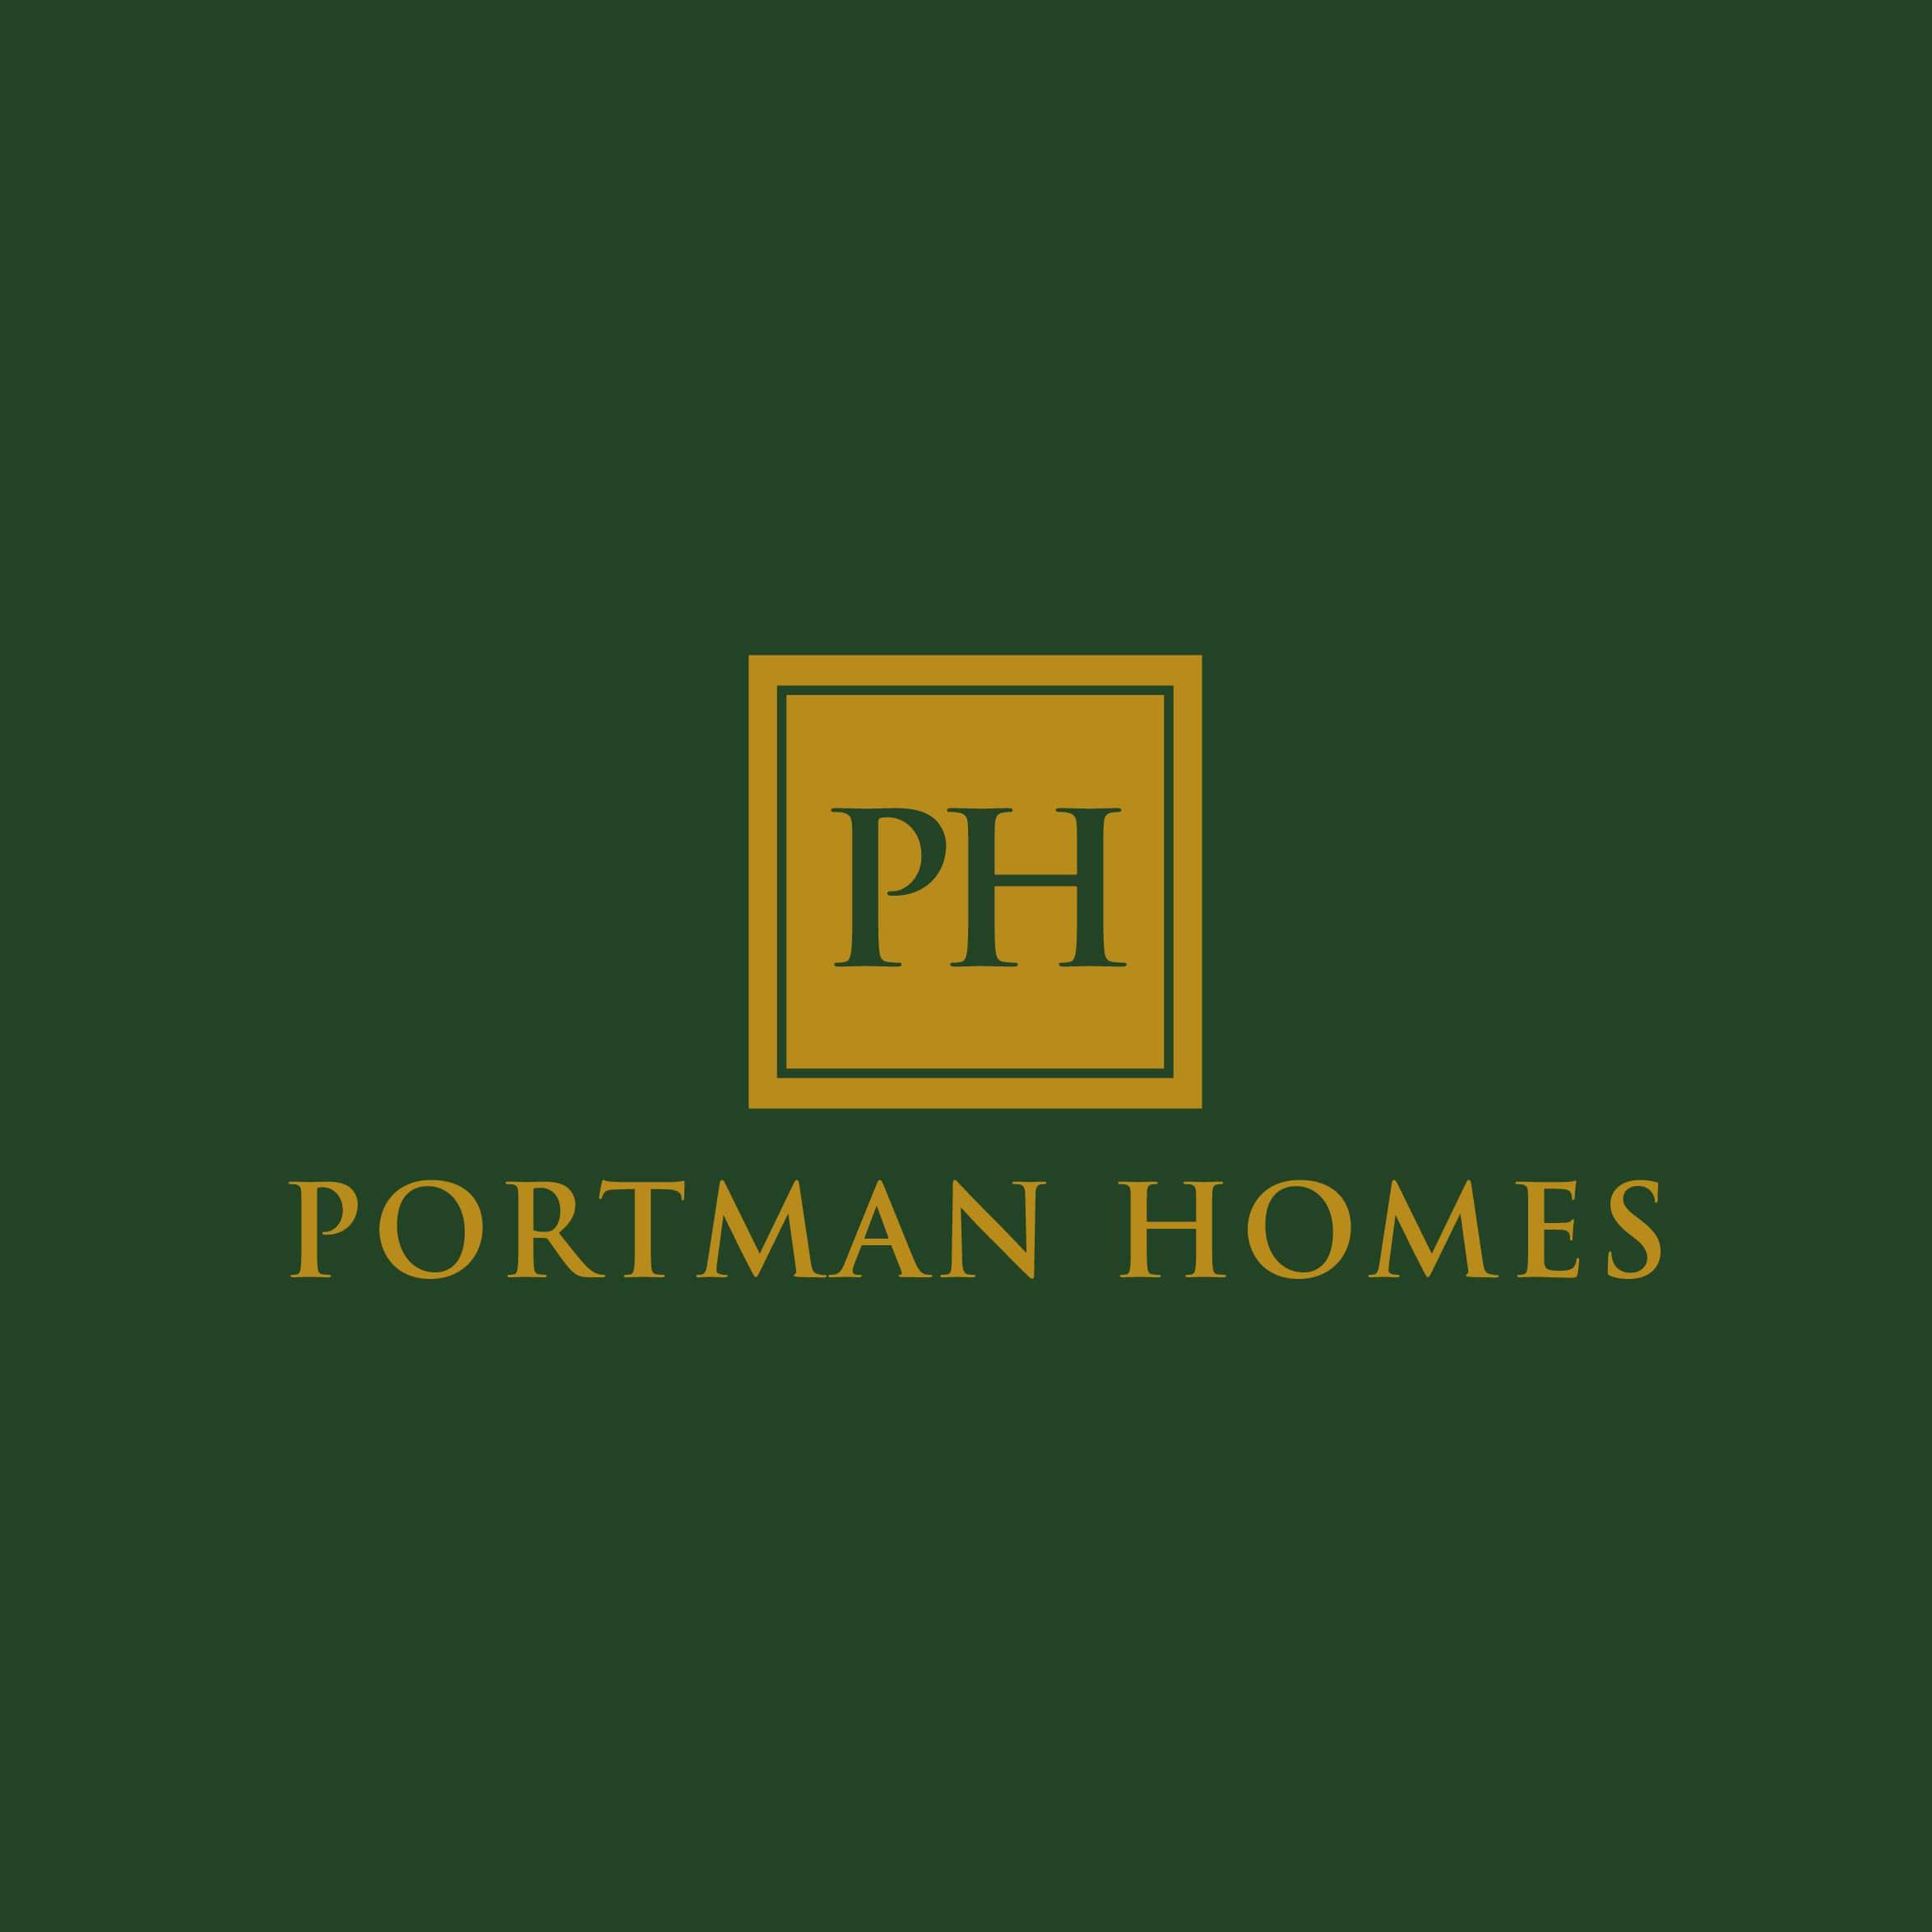 Portman Homes Hi Res logo - Cryojuvenate 2019 Calendar in aid of Breast Cancer Care